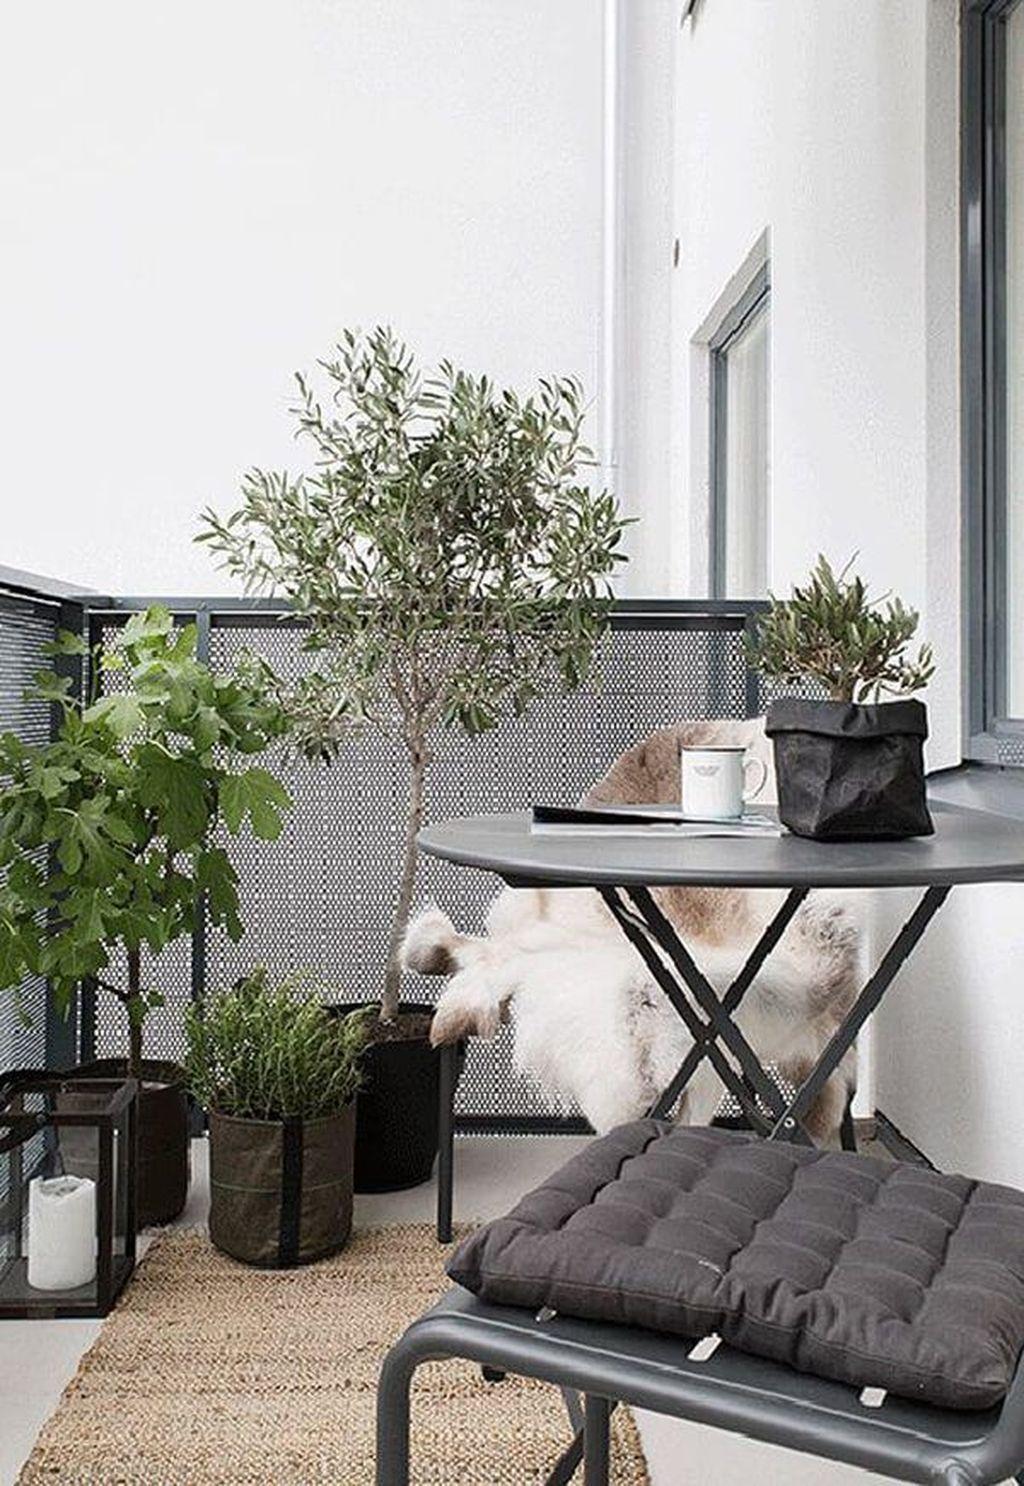 Inspiring Summer Apartment Balcony Decoration Ideas 27